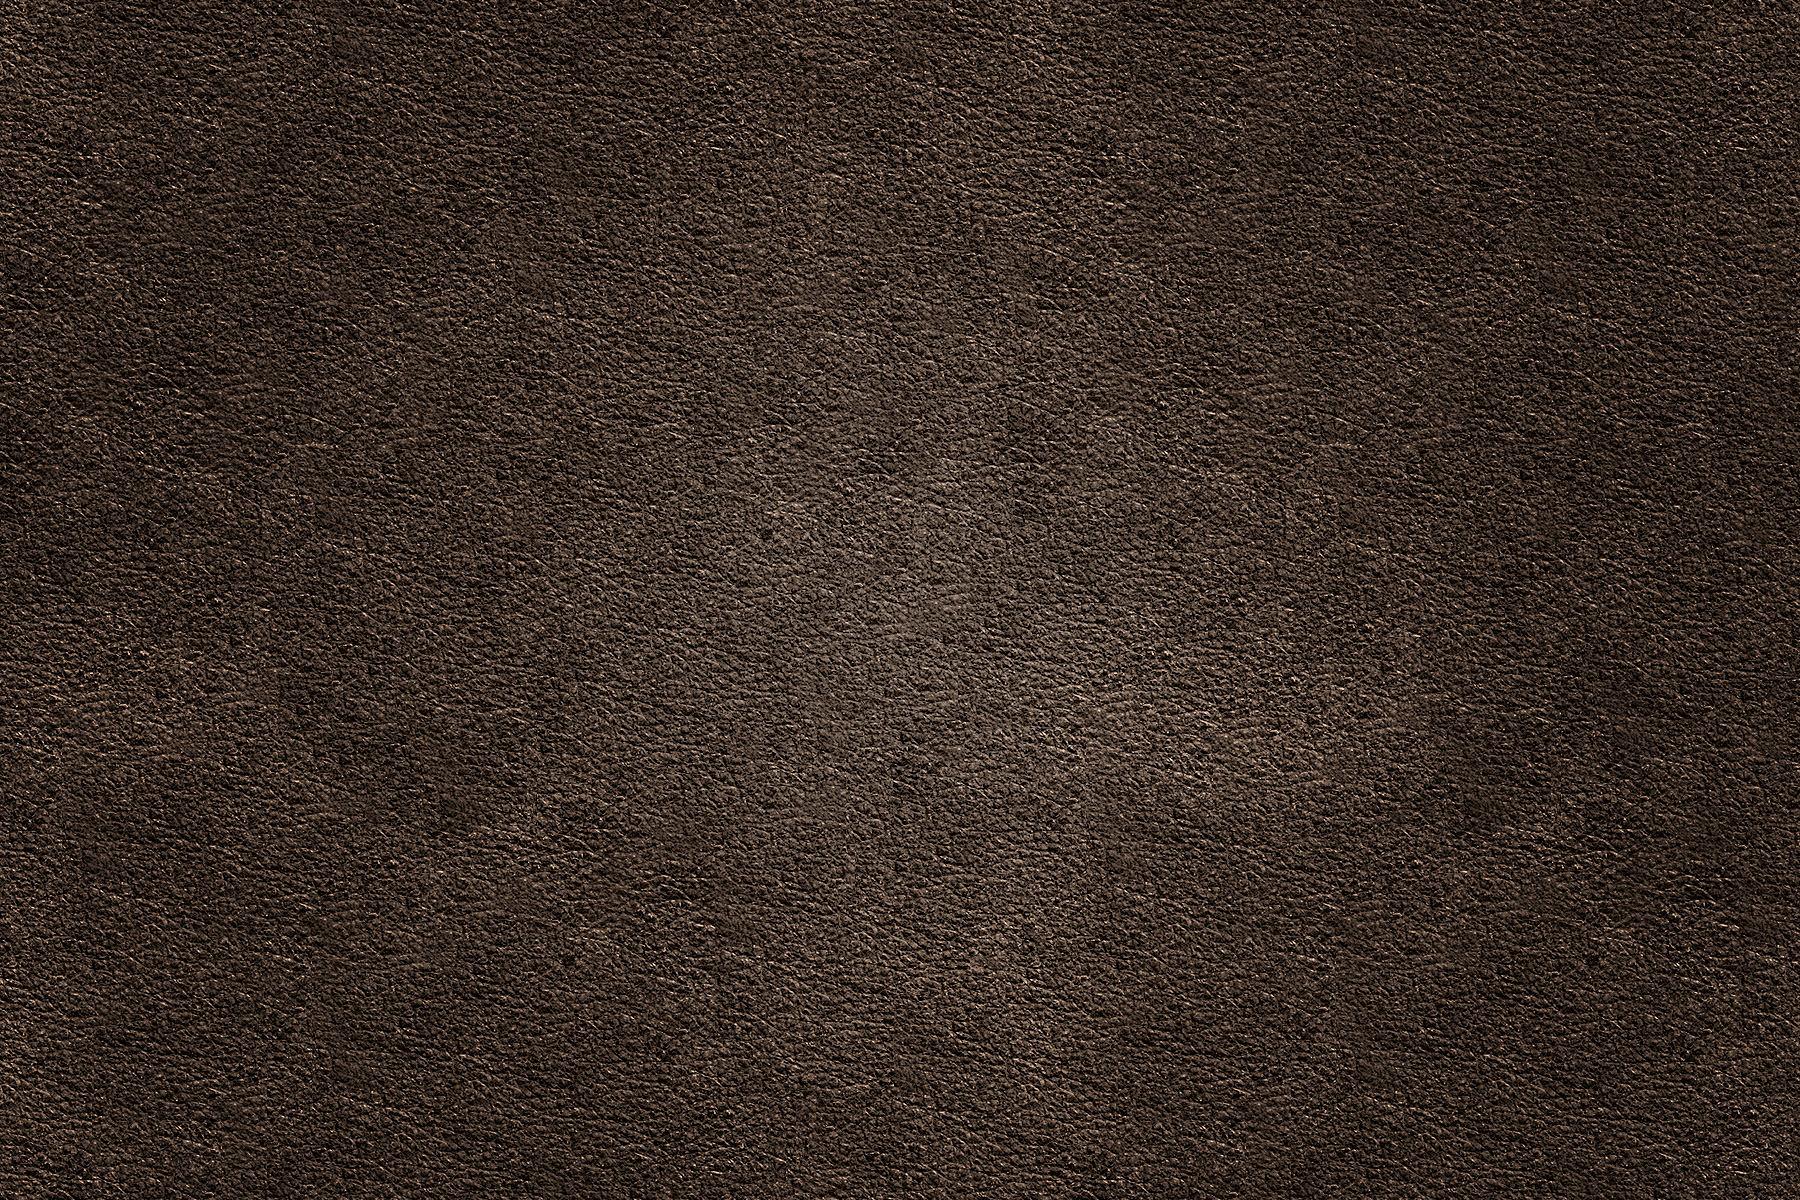 55 Free Distressed Textures Grunge FreeCreatives